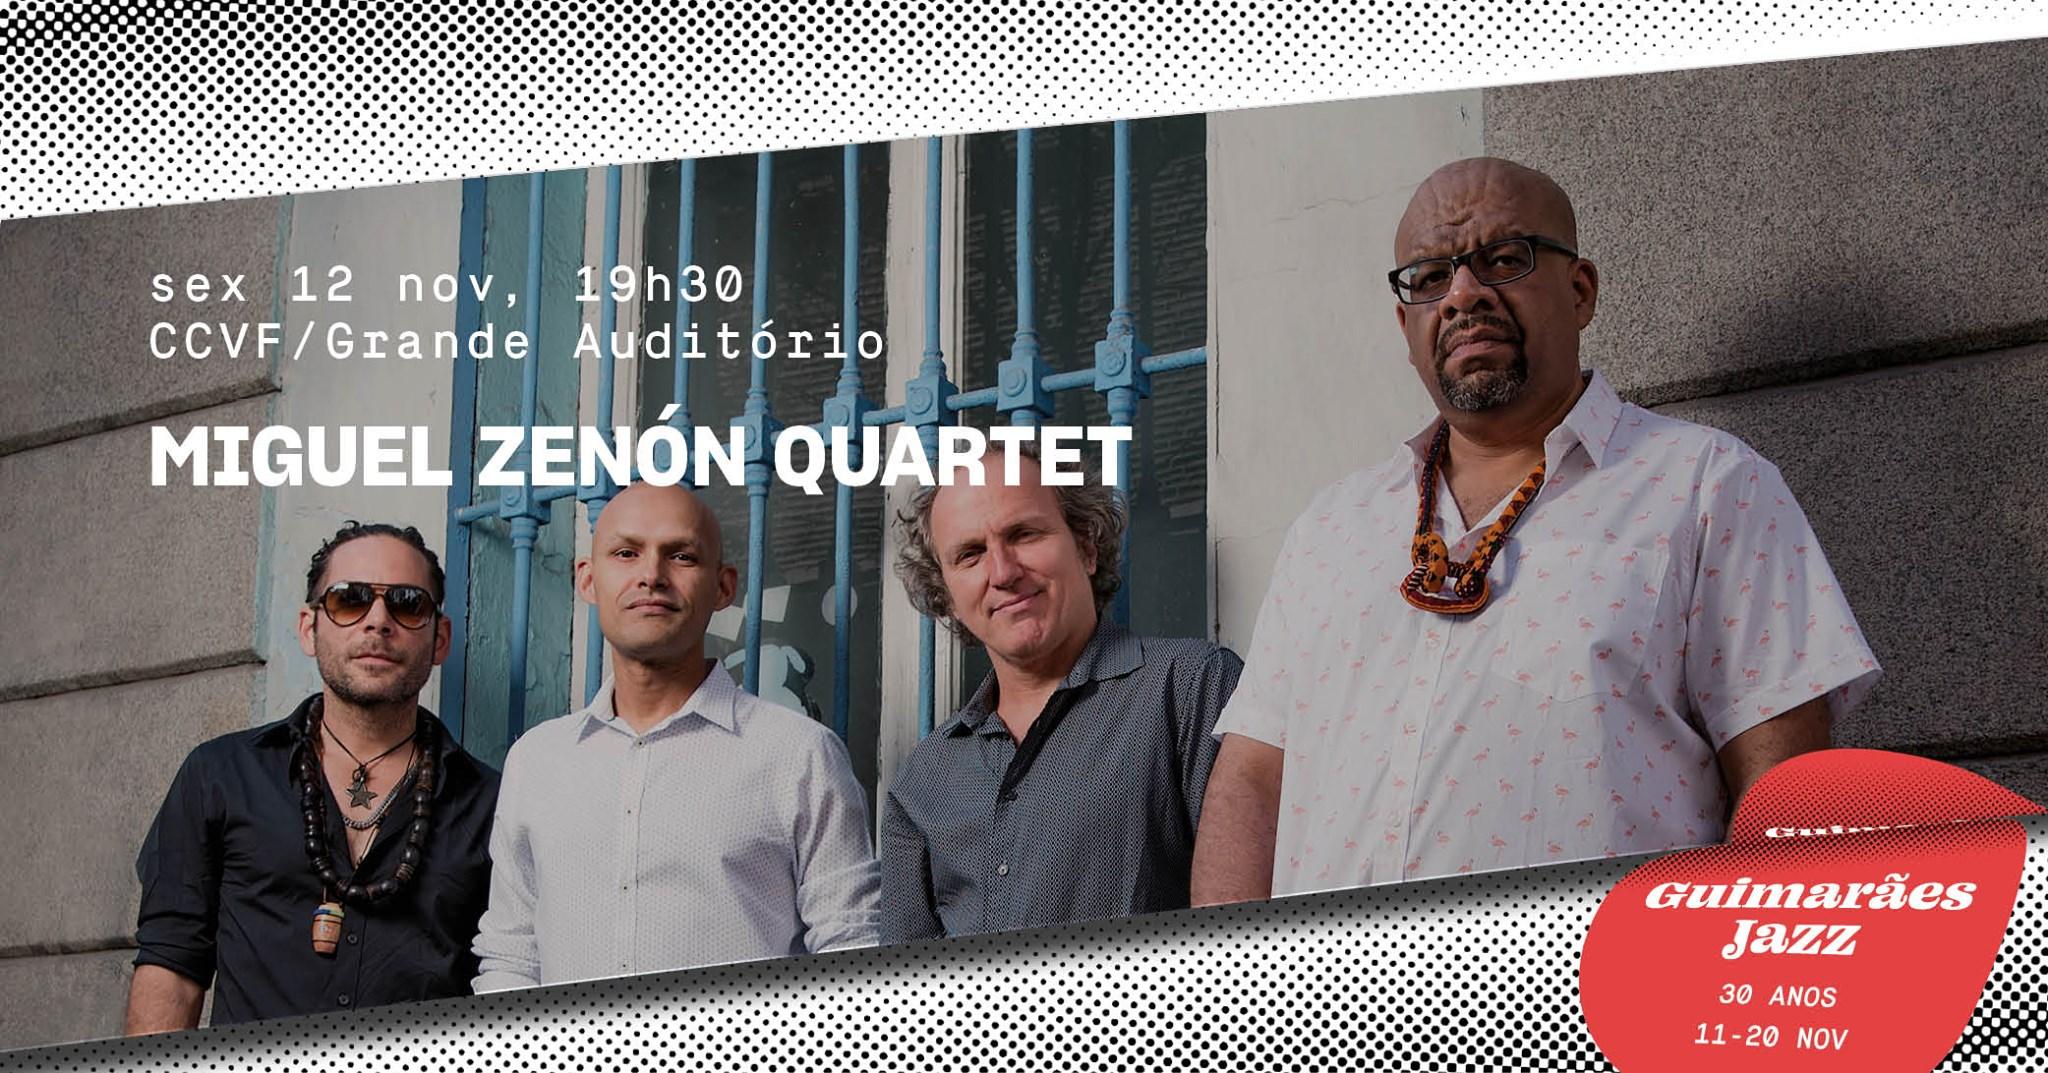 Guimarães Jazz 2021 • Miguel Zenón Quartet